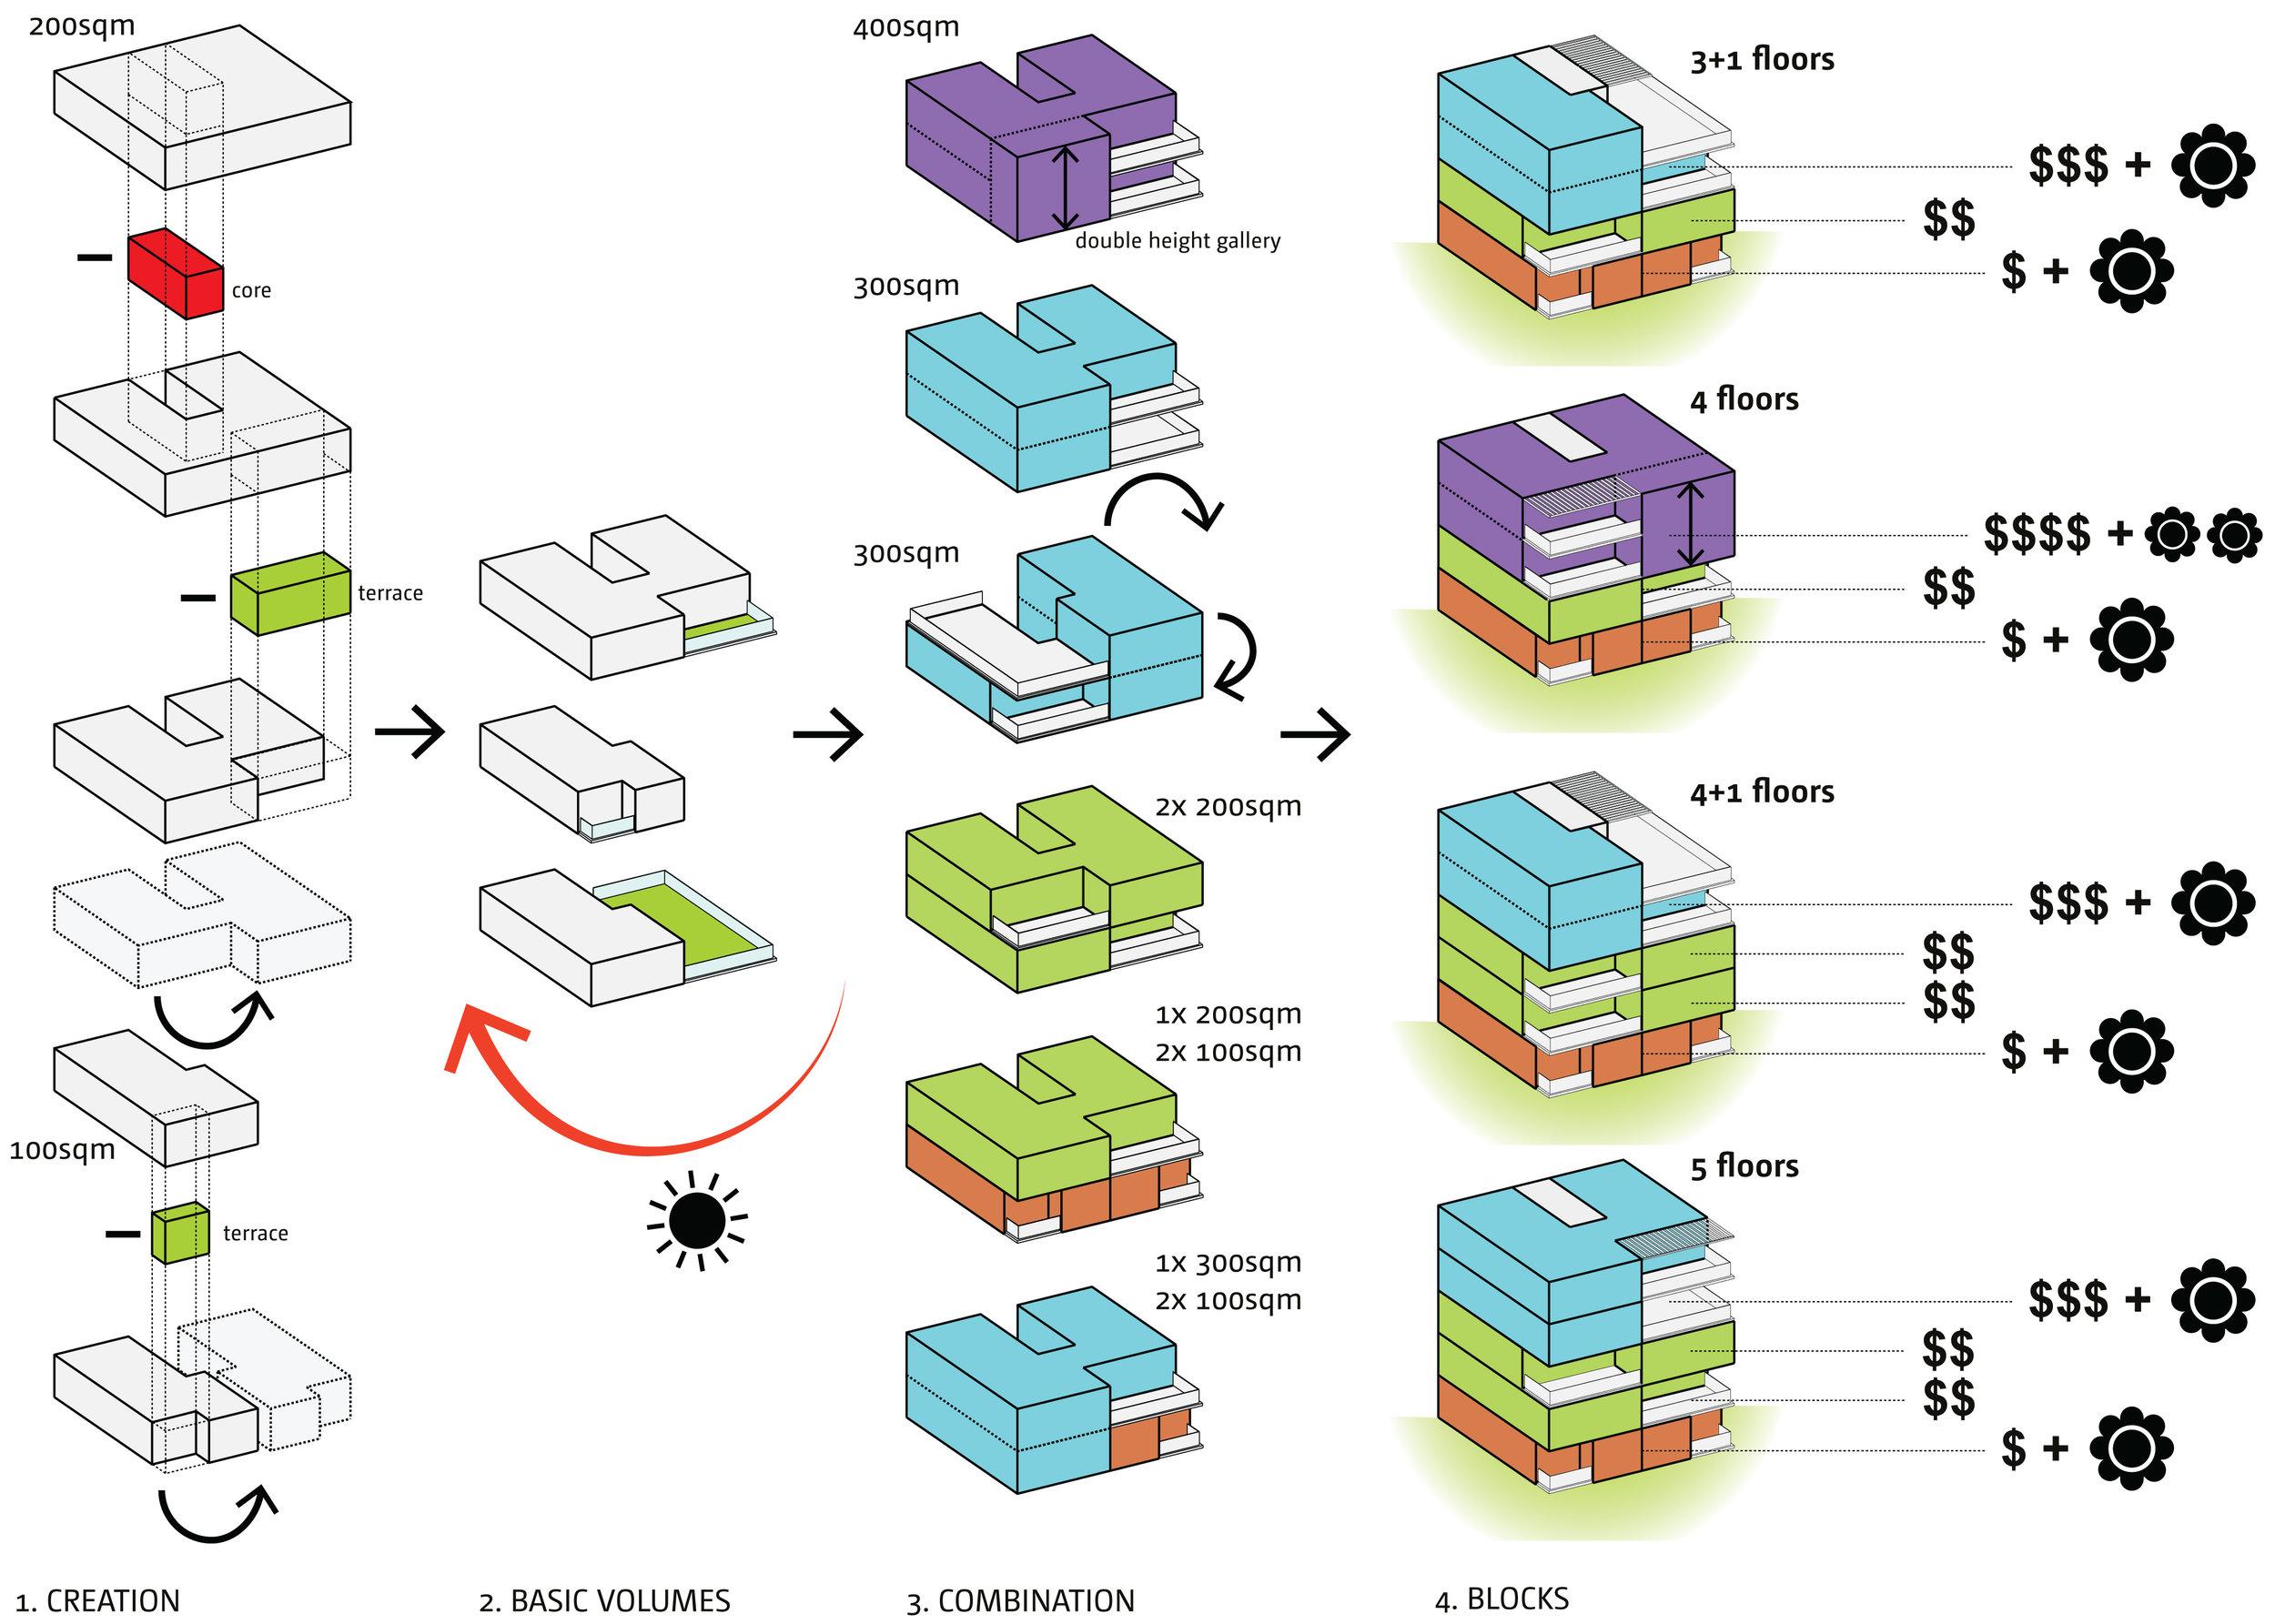 180213_MIX_diagrams-1.jpg